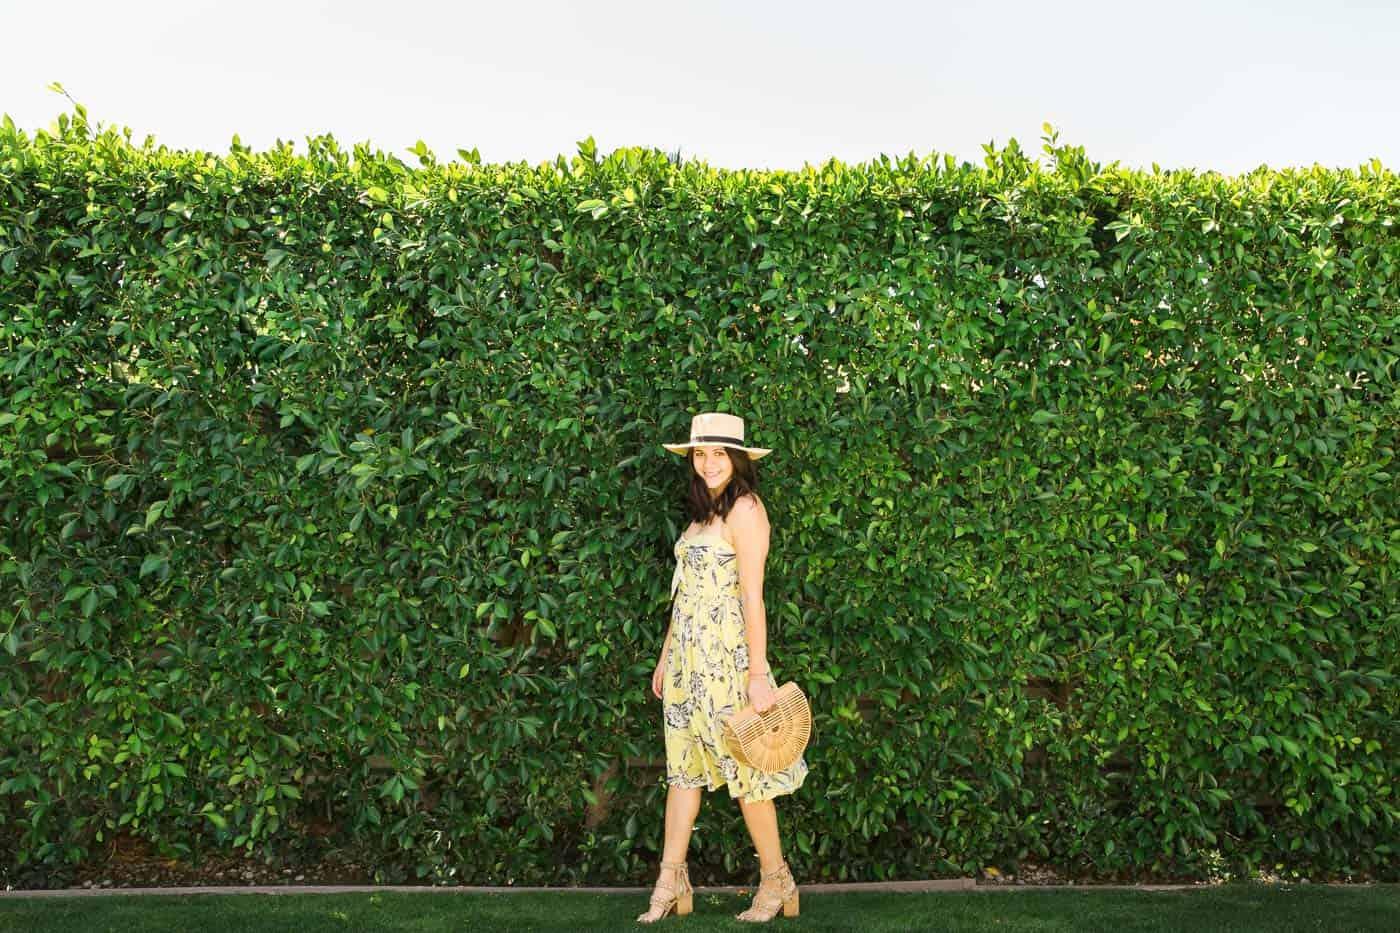 yellow sundress, summer outfit - My Style Vita @mystylevita